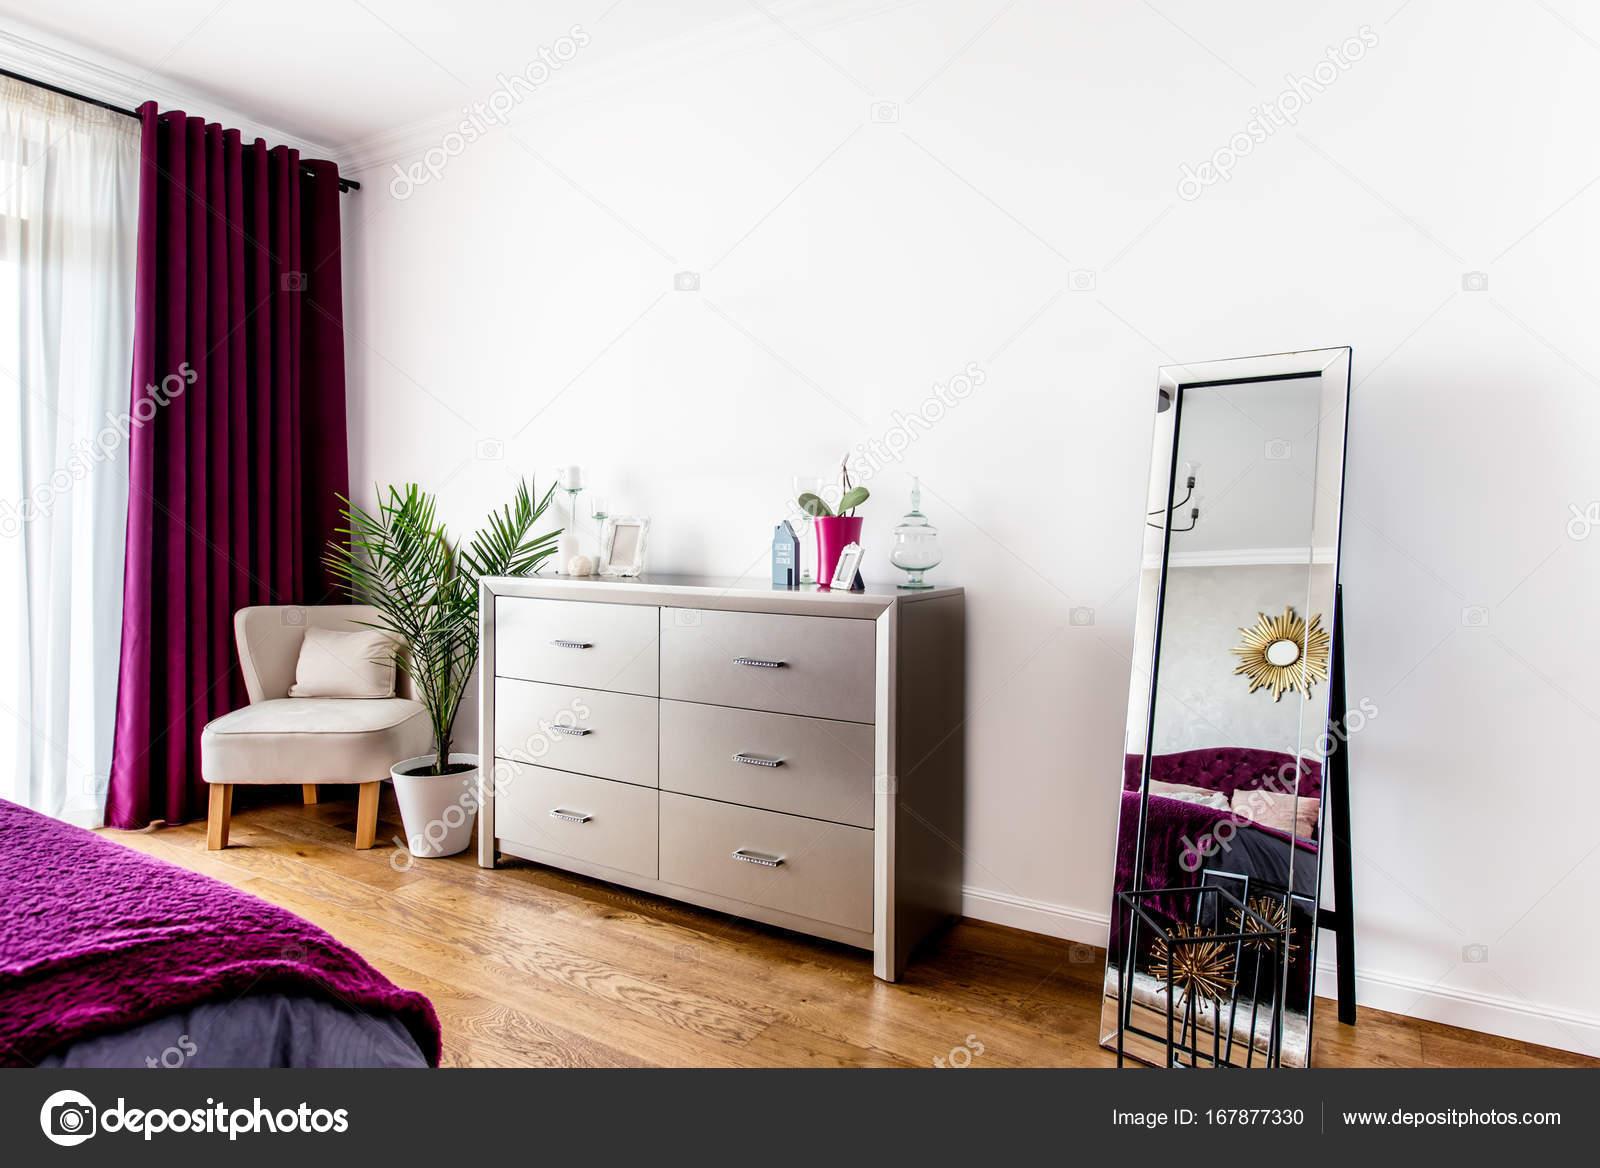 Modern Gezellig Interieur : Gezellige slaapkamer interieur scandinavische stijlvolle